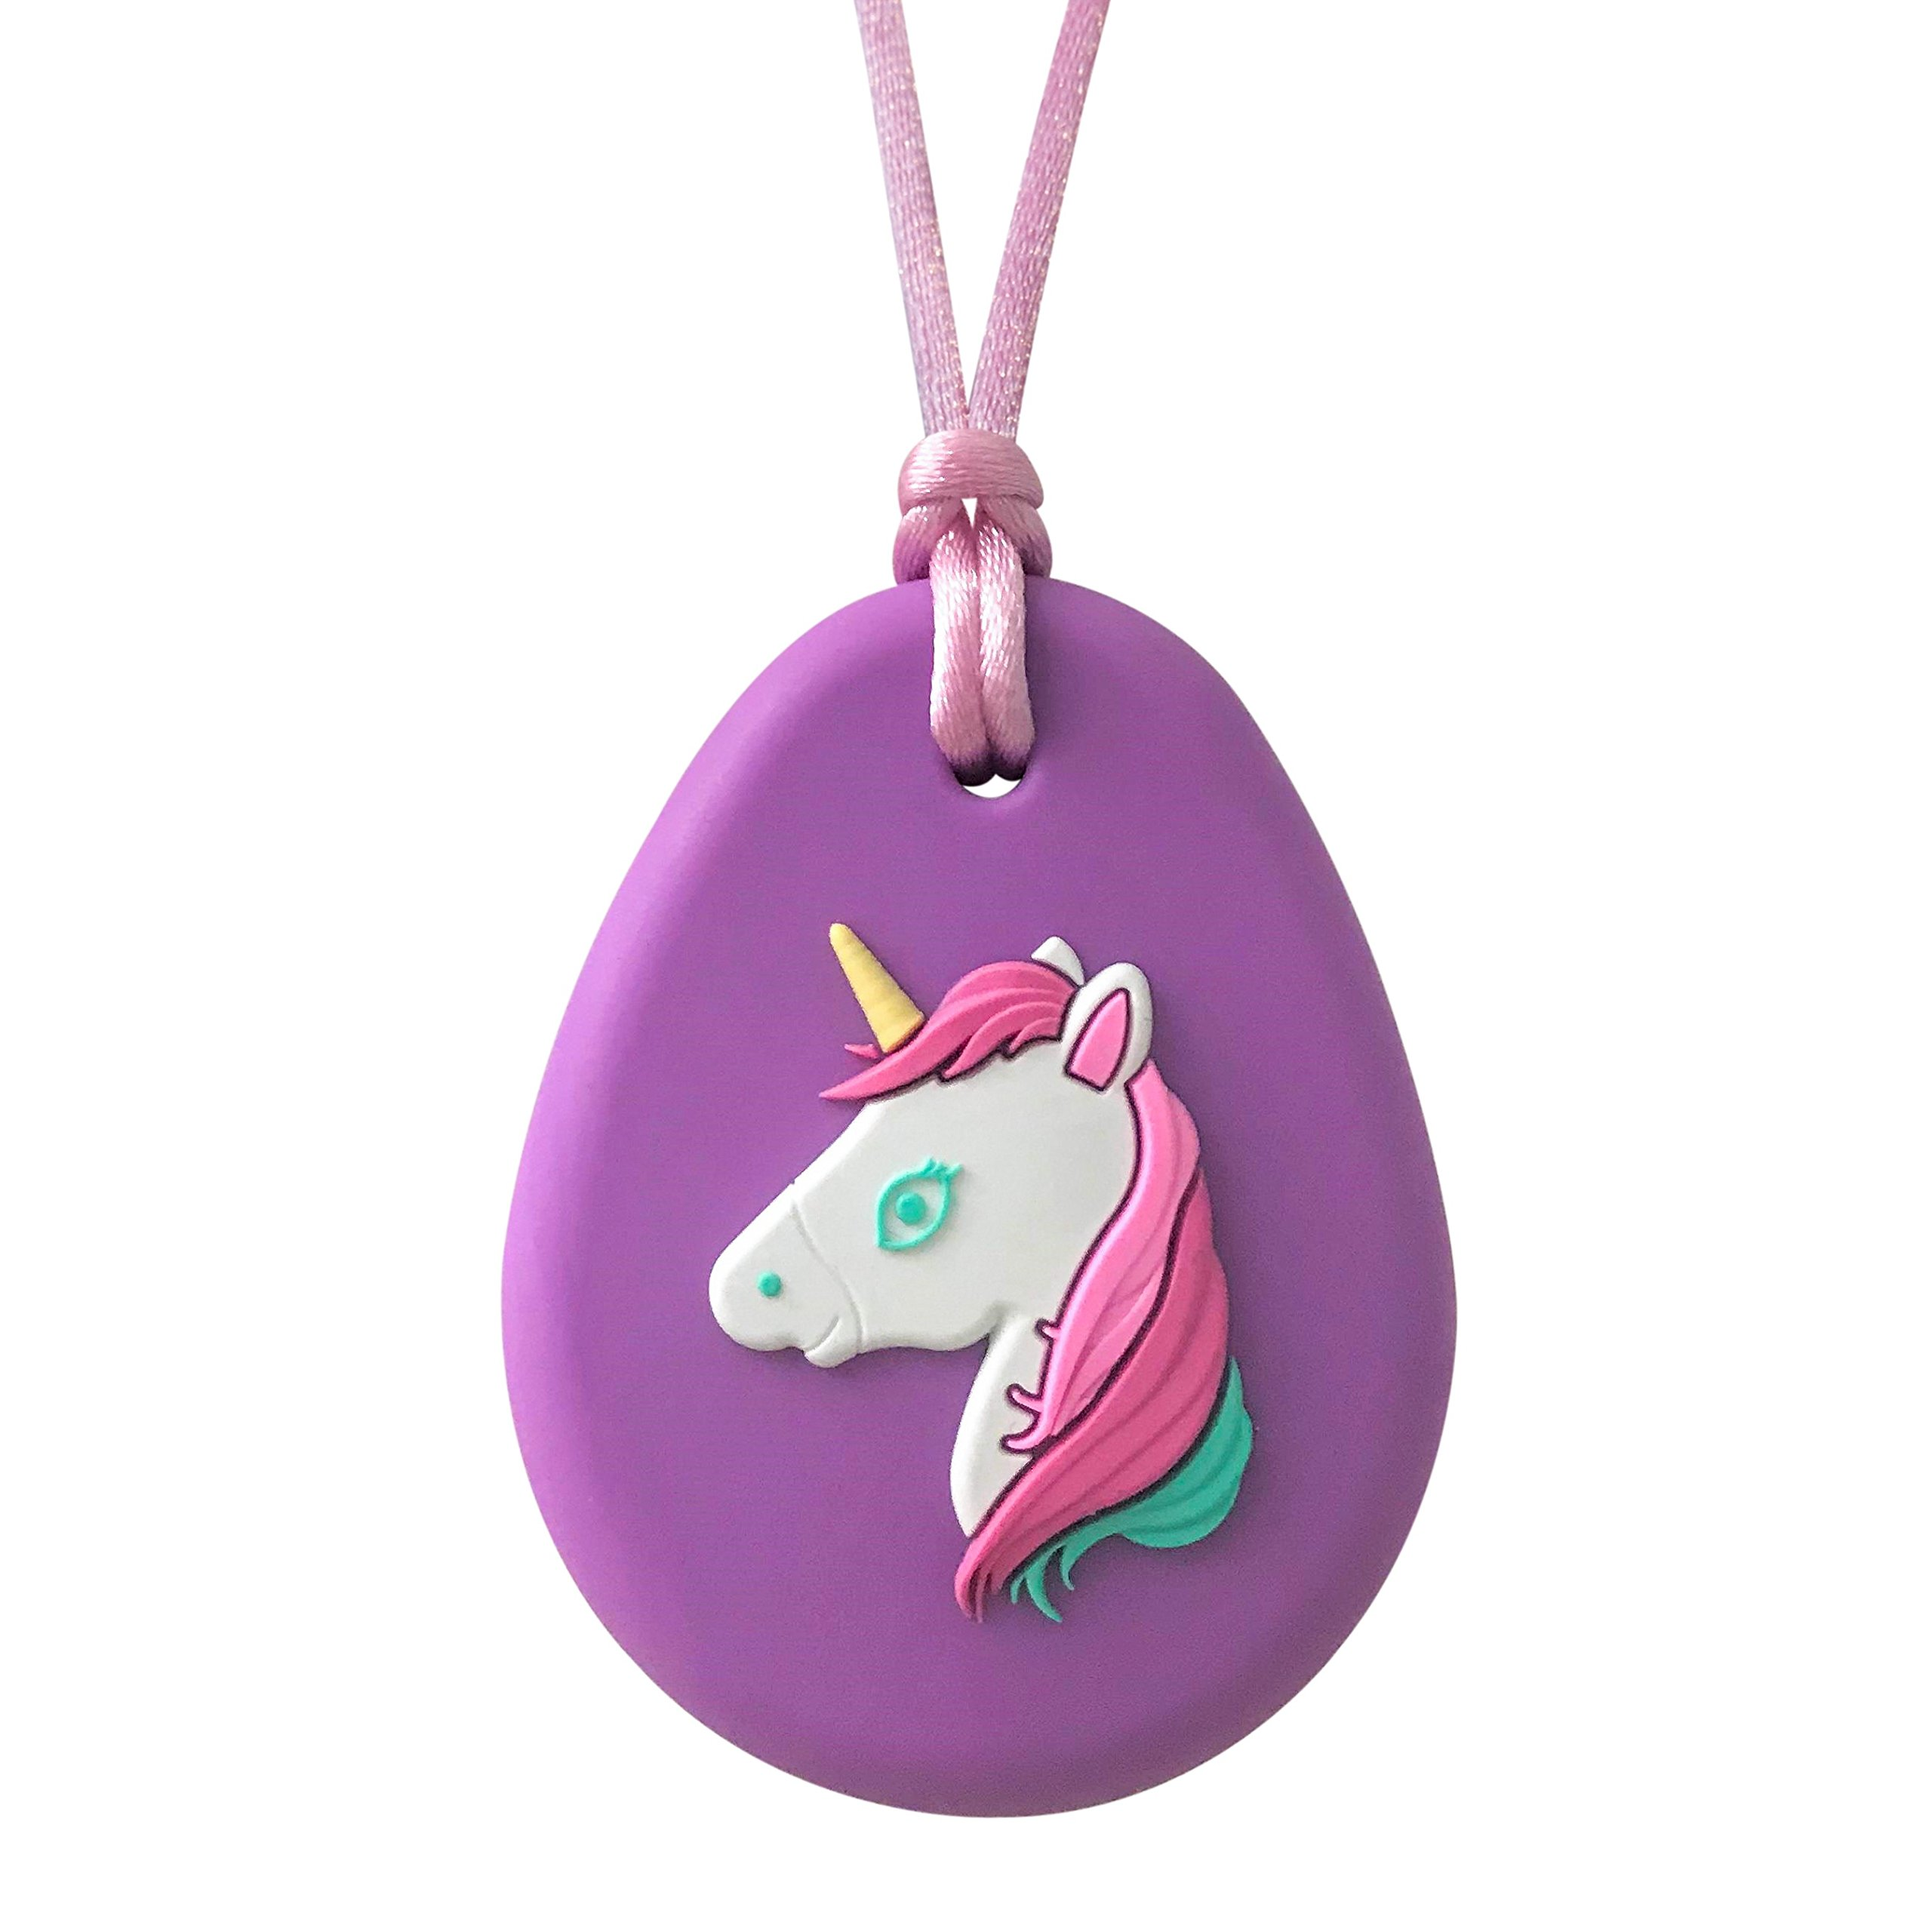 Sensory Oral Motor Aide Chewelry Necklace - Chewy Fidget Toy – Unicorn (Purple)